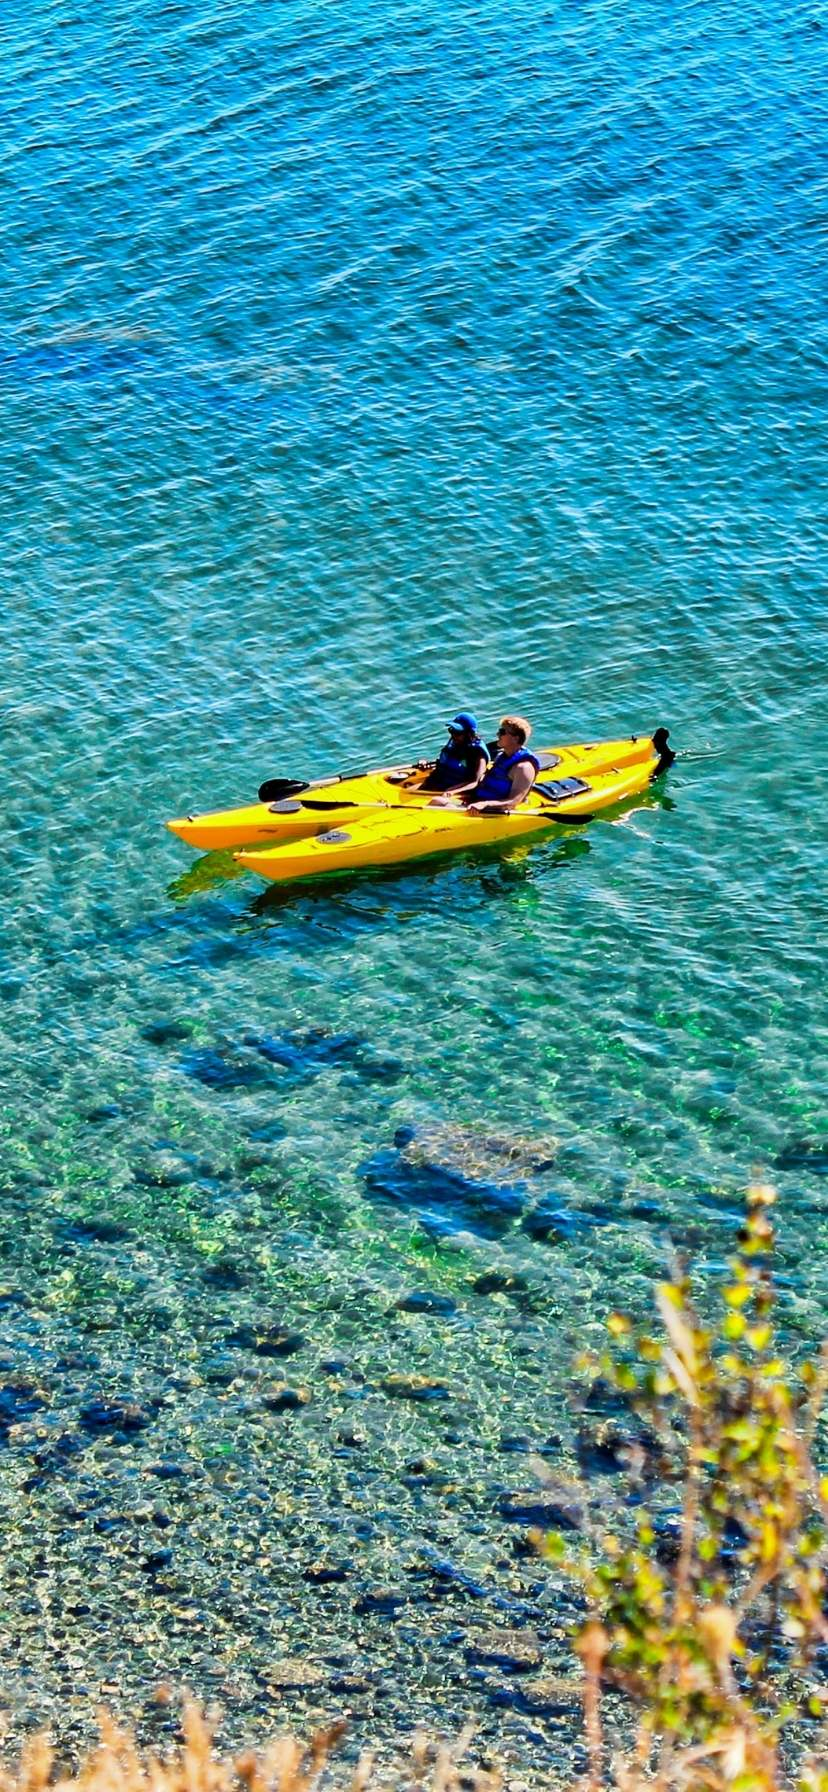 Kayakers at Orcas Island Kayaking in the San Juans